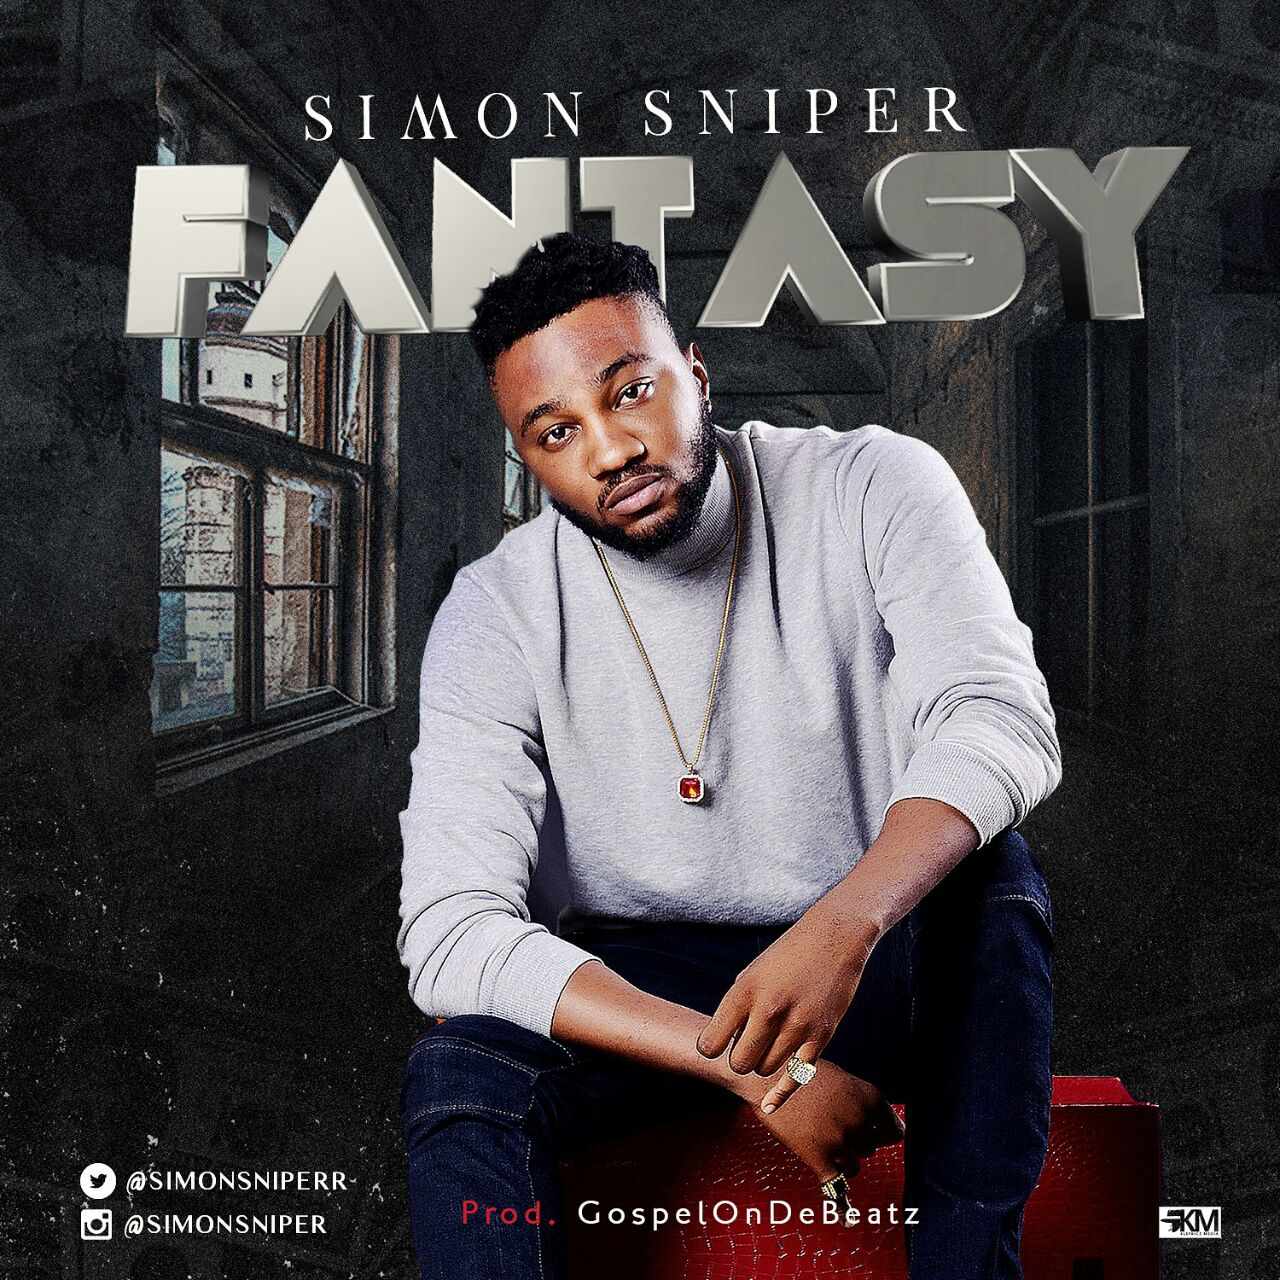 Simon Sniper – Fantasy (Prod. GospelOnDeBeatz)